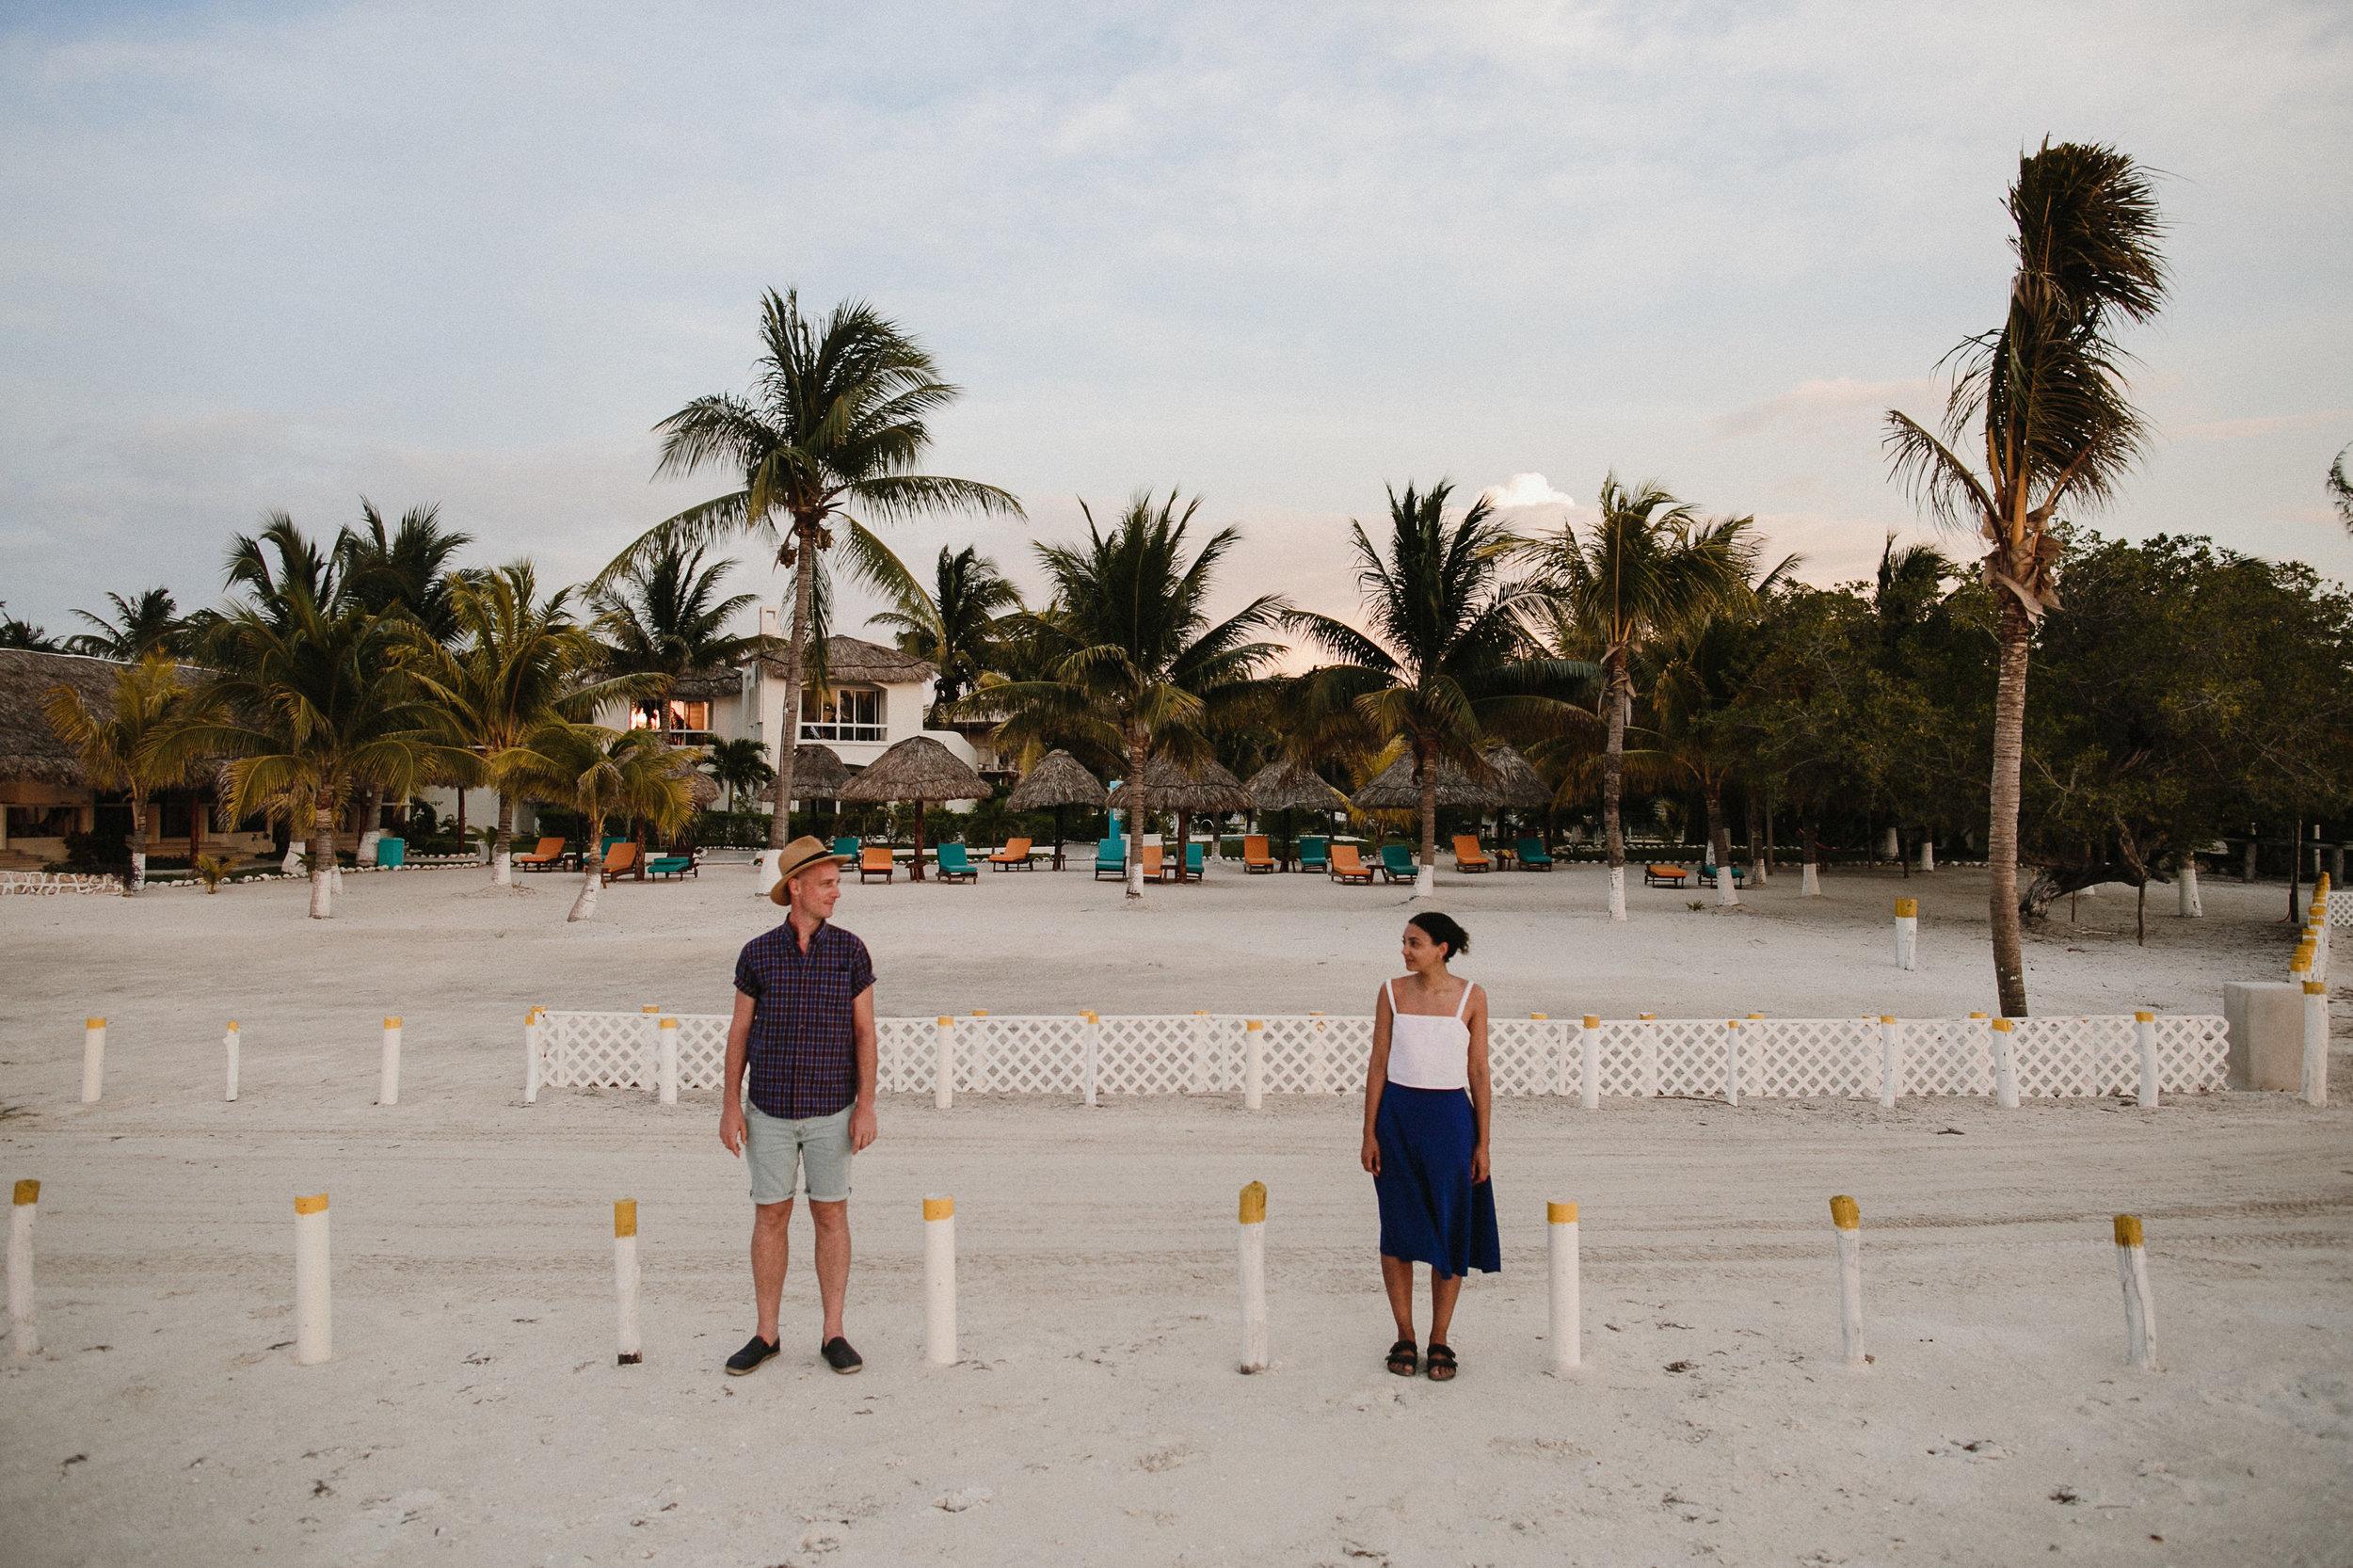 alfonso_flores_destination_wedding_photographer__HOLBOX_5.JPG